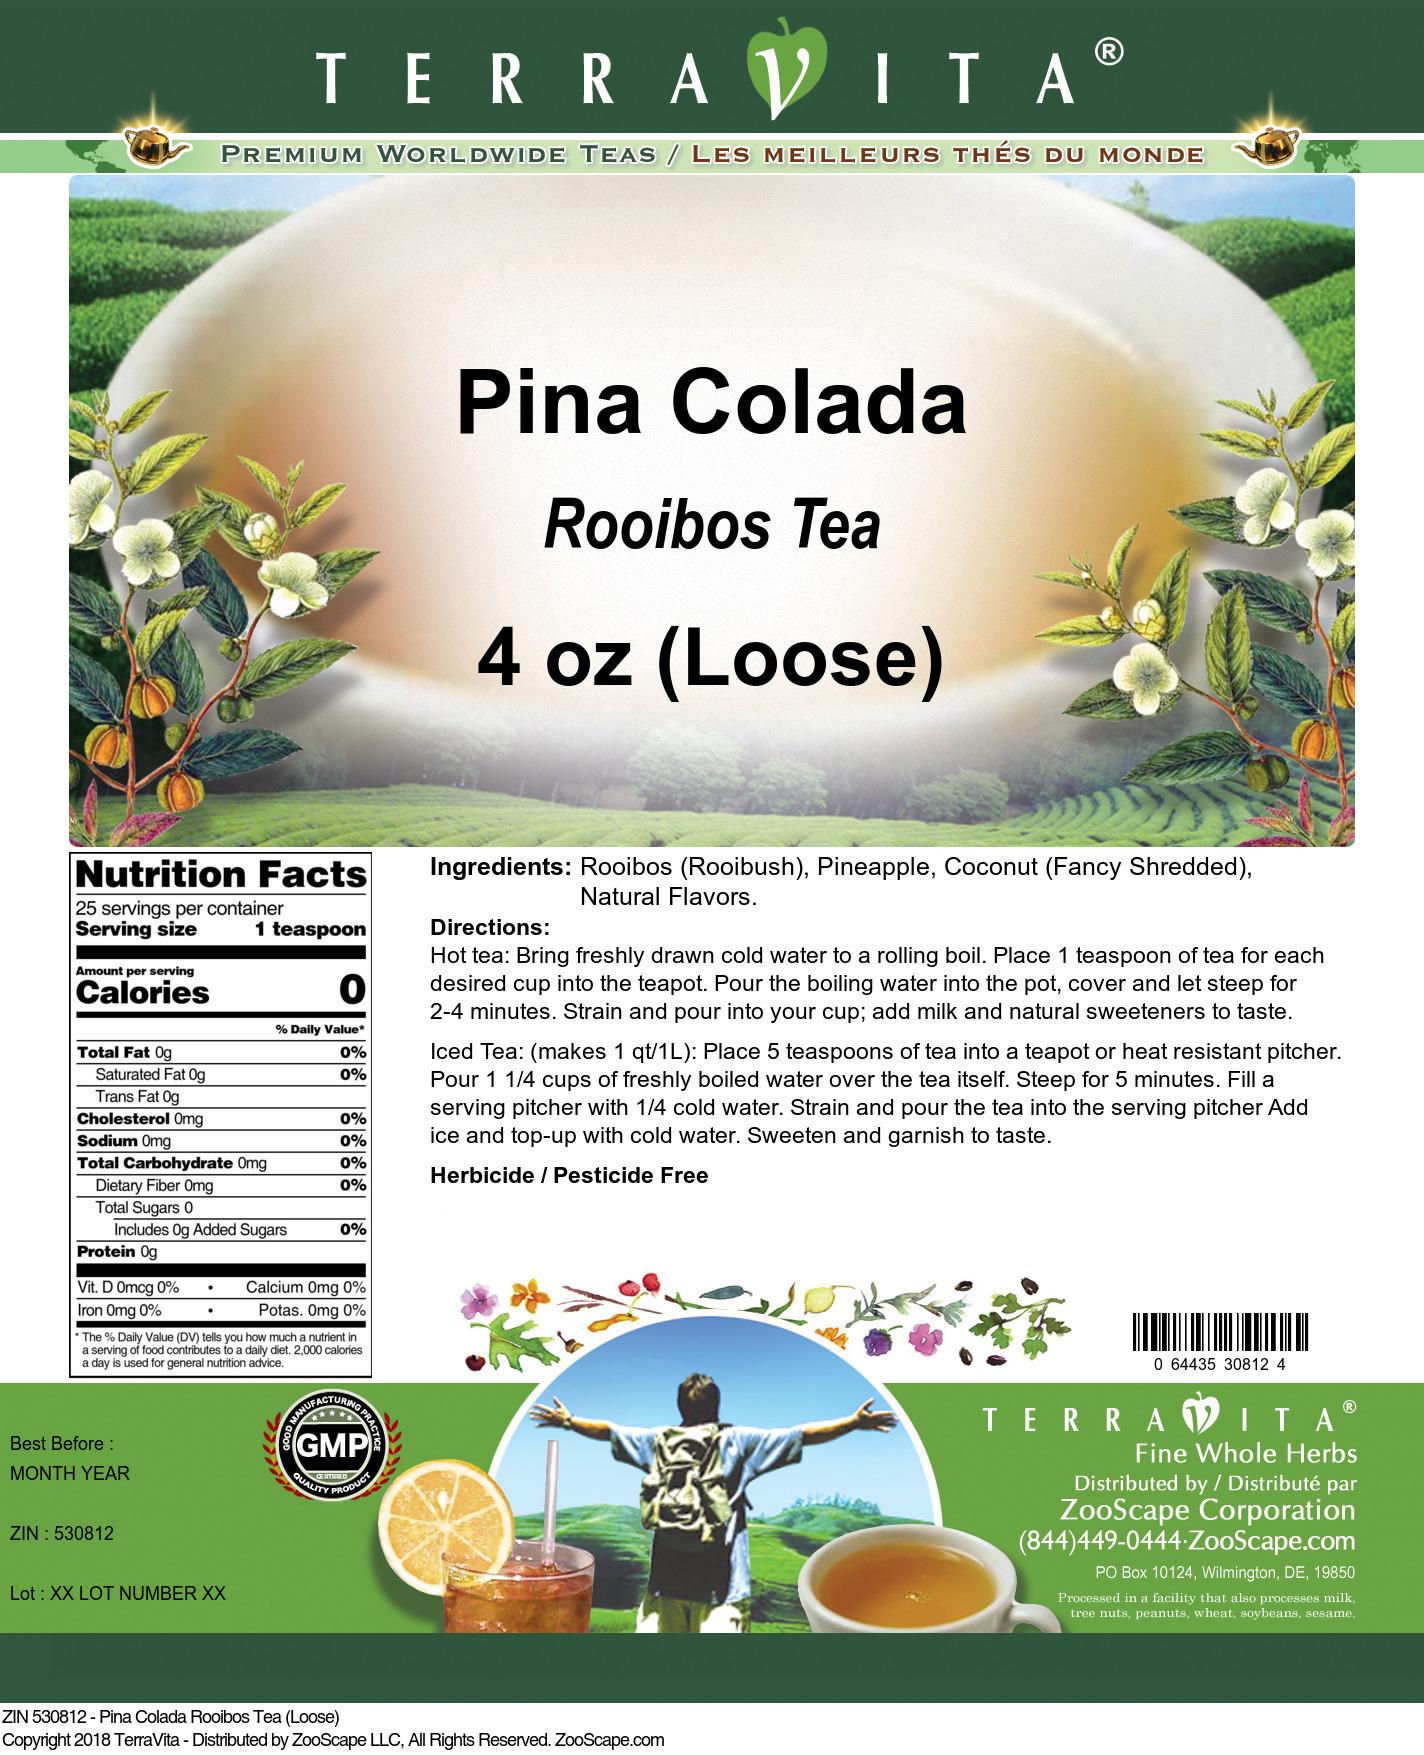 Pina Colada Rooibos Tea (Loose)